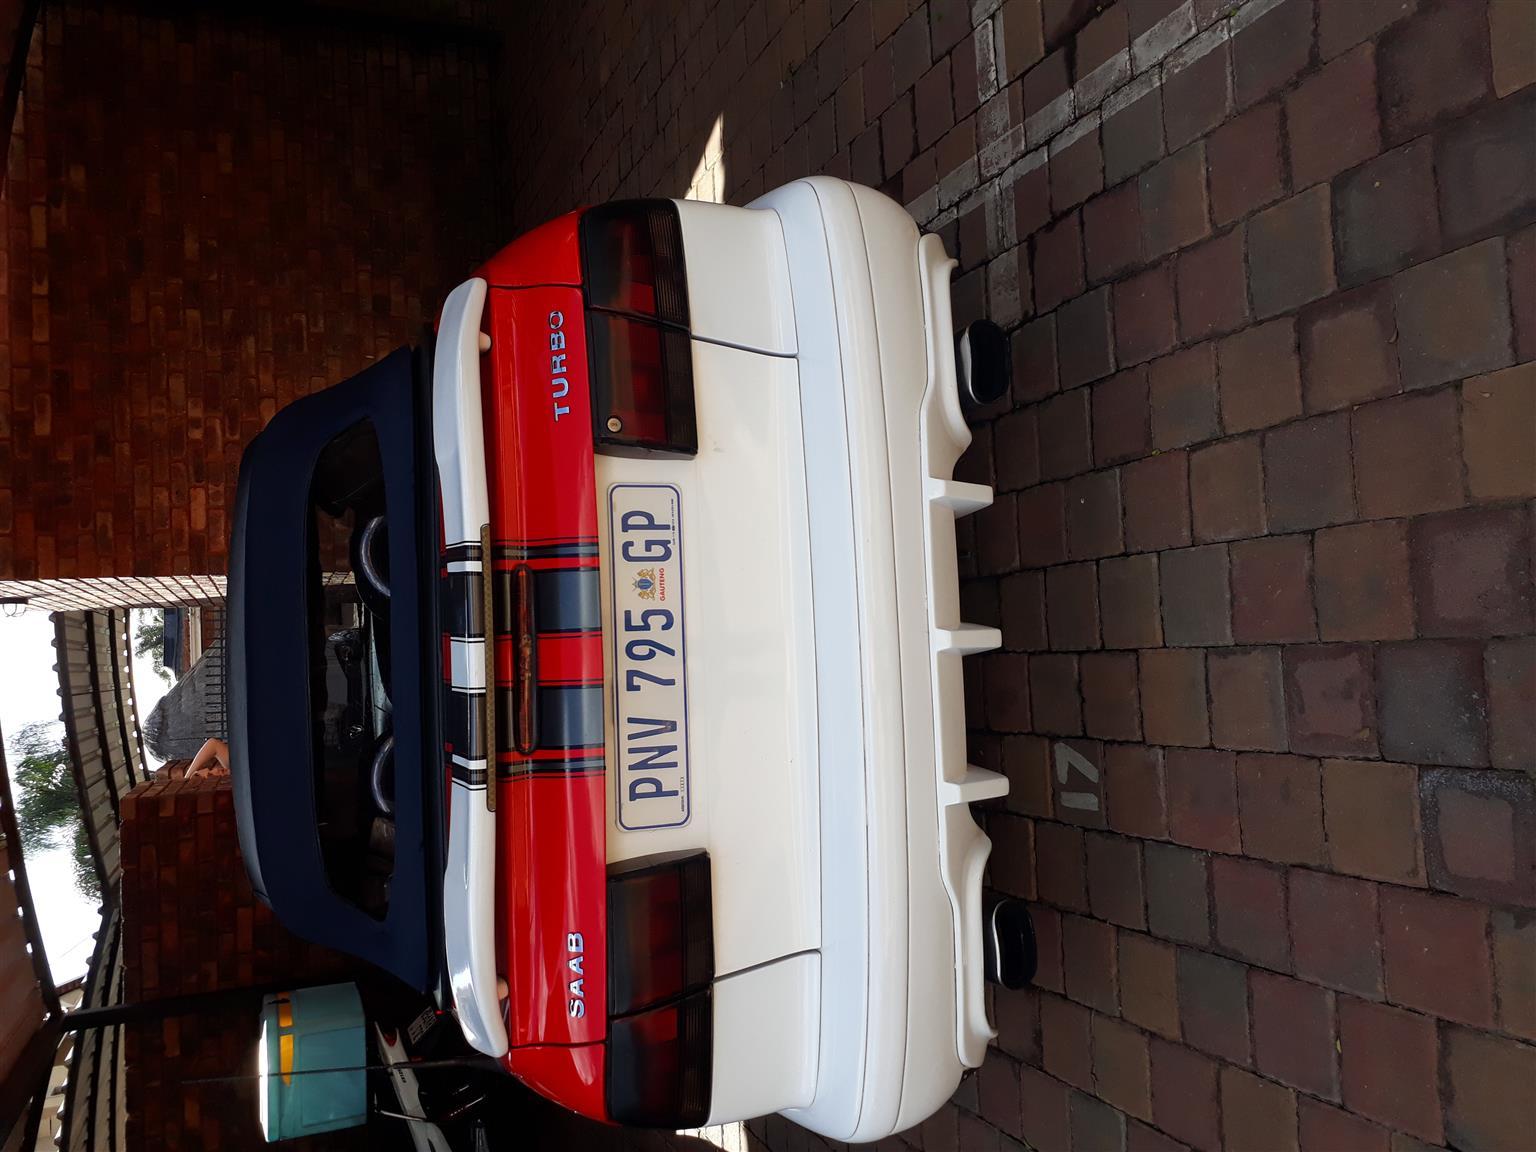 1996 Saab 9-3 convertible 2.0t Linear